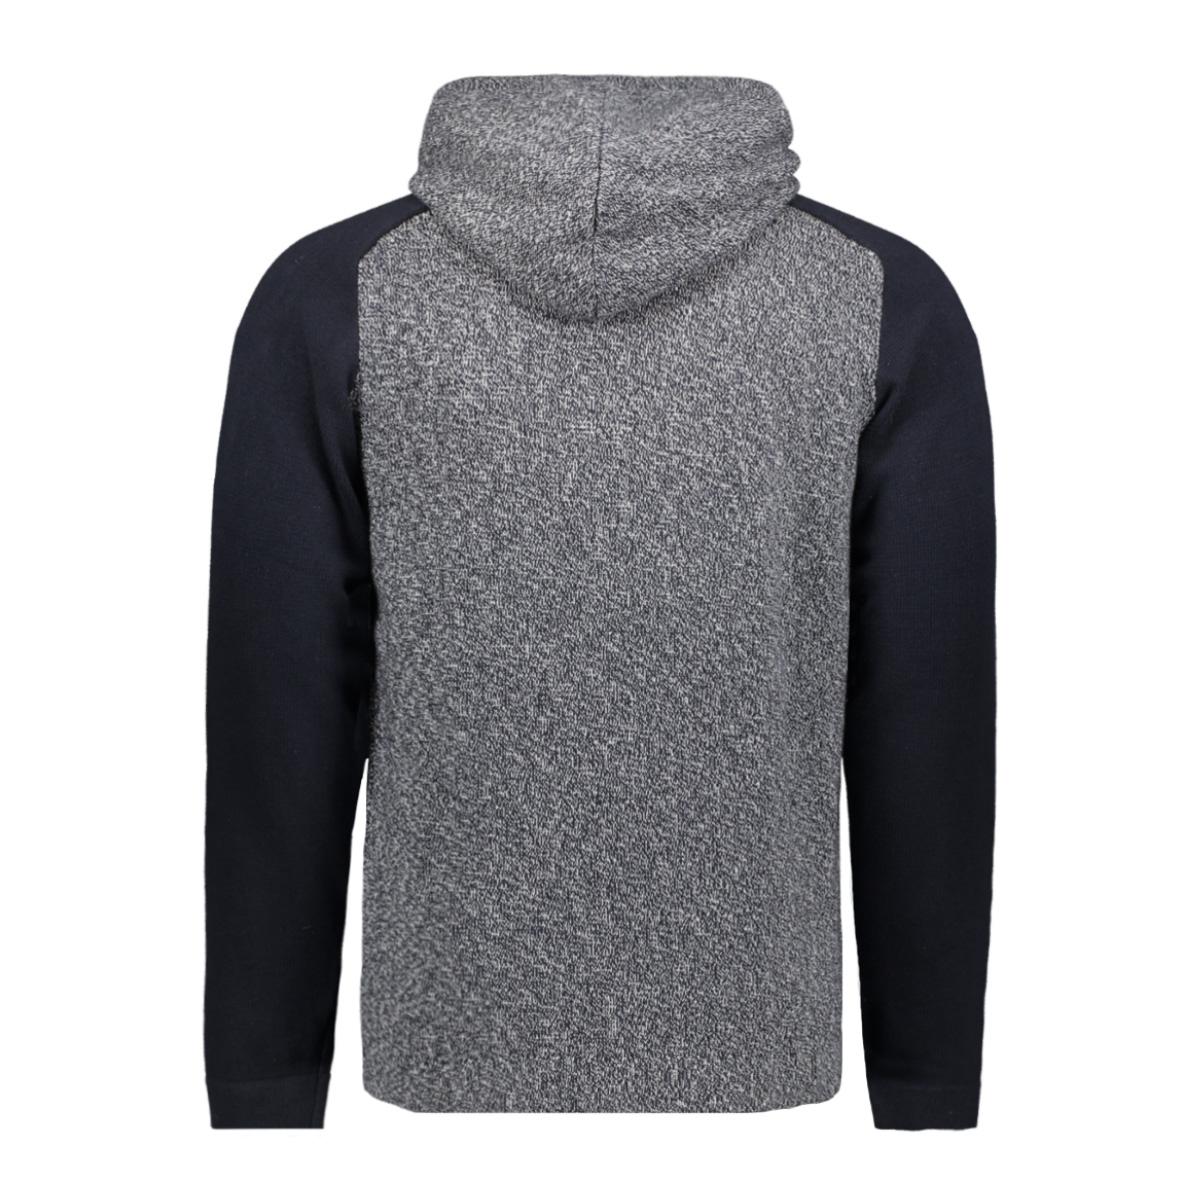 jcomix knit hood cardigan 12157836 jack & jones vest sky captain/melange body